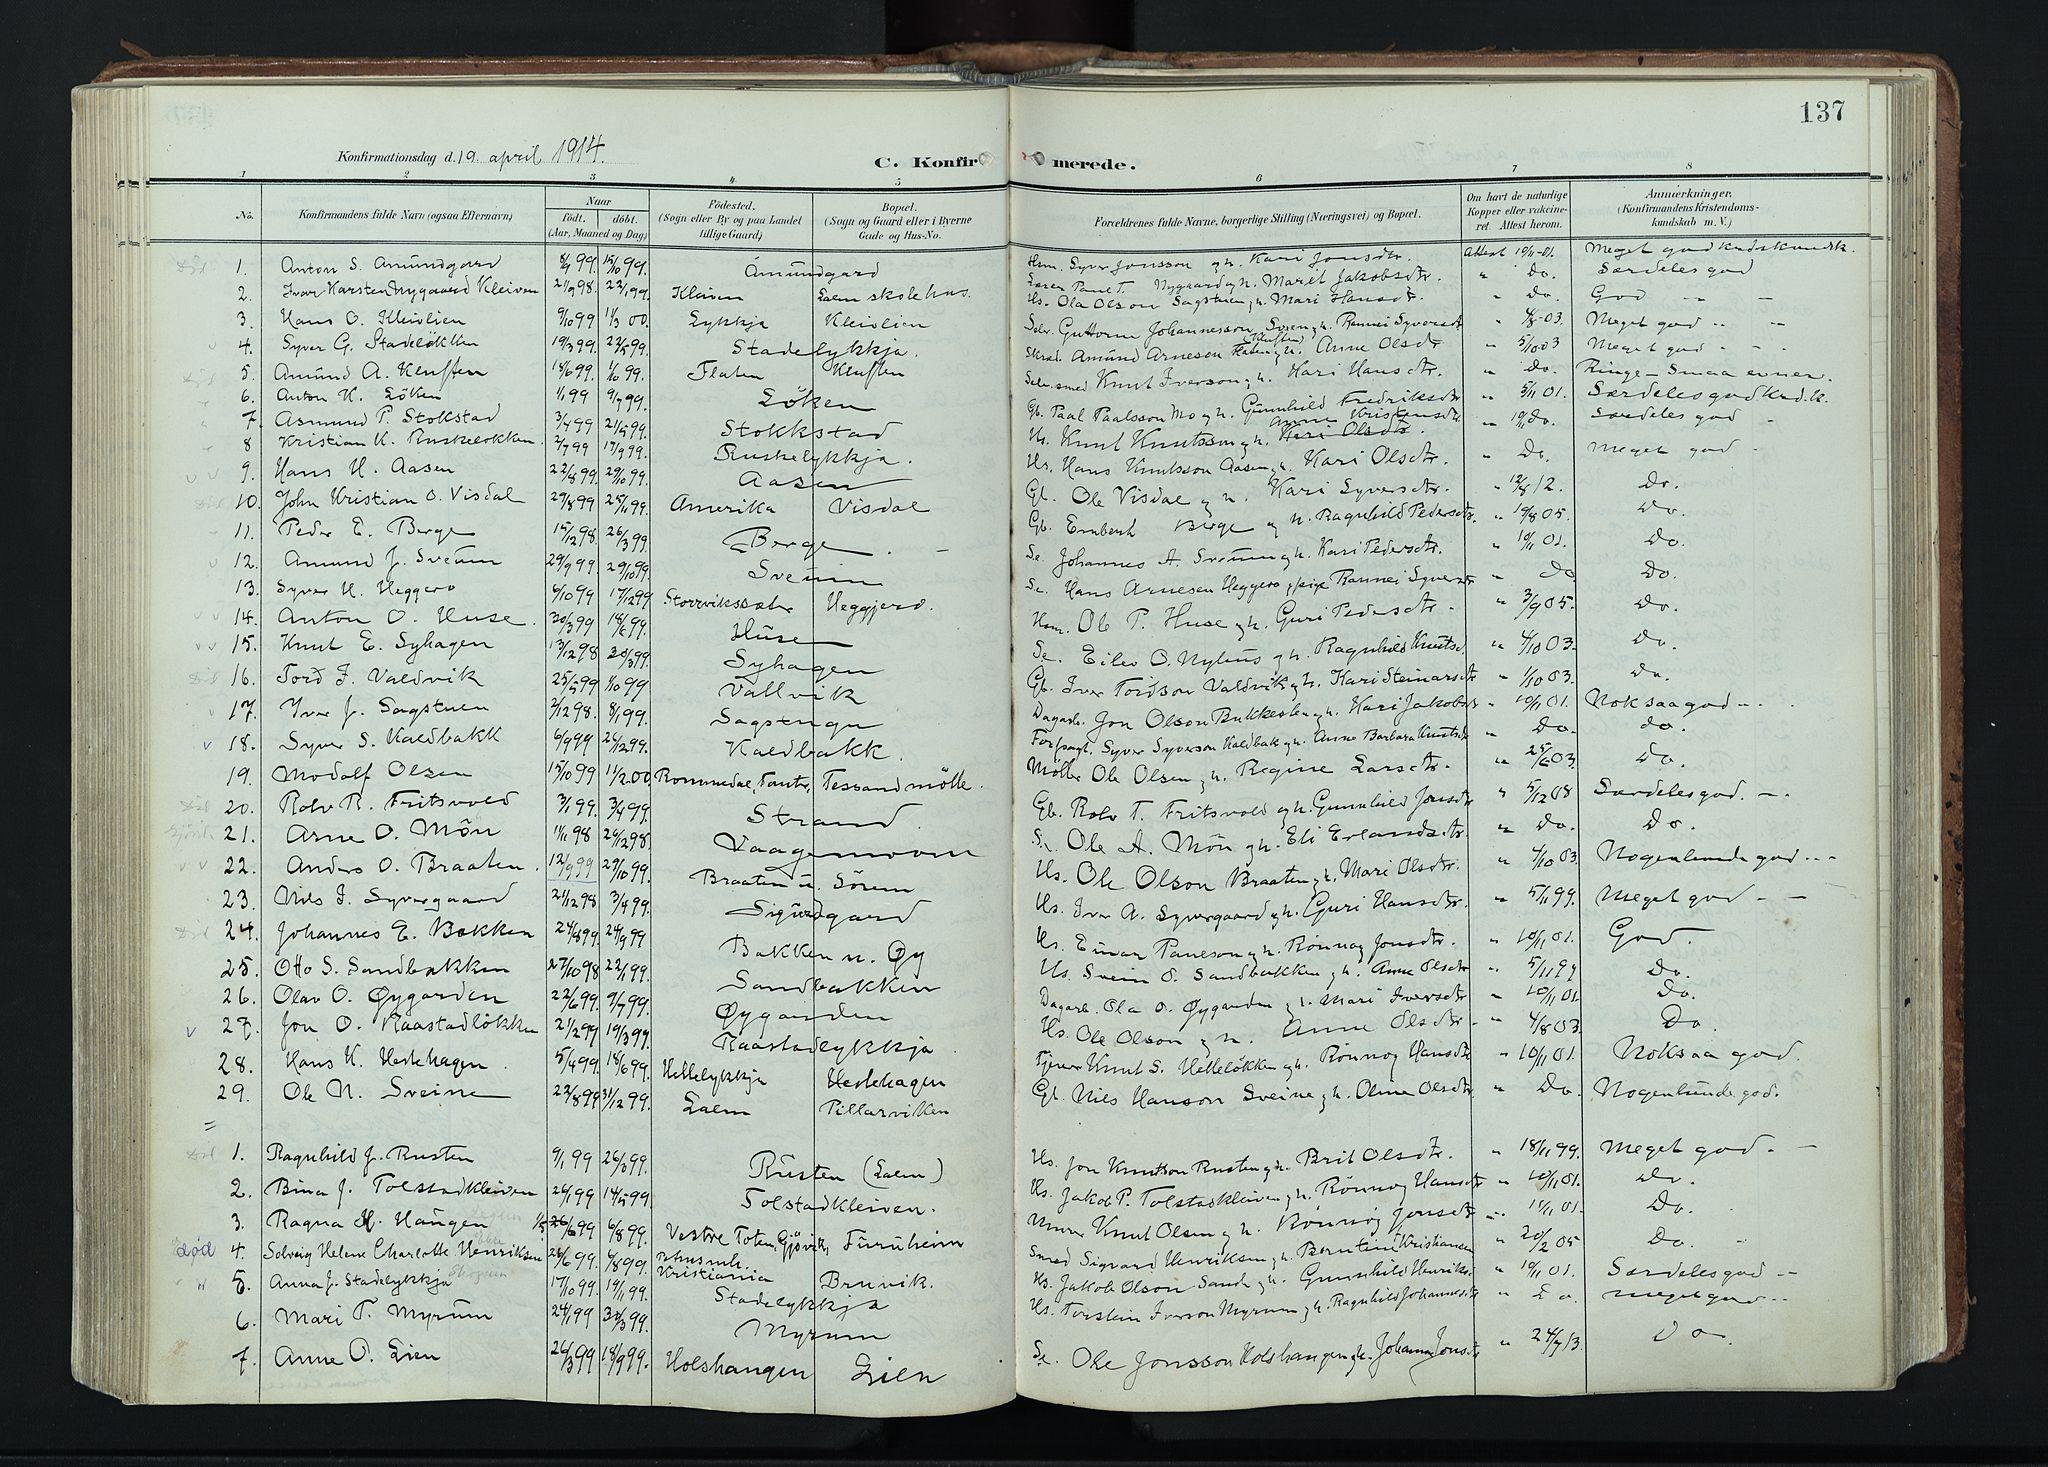 SAH, Vågå prestekontor, Ministerialbok nr. 11, 1905-1924, s. 137